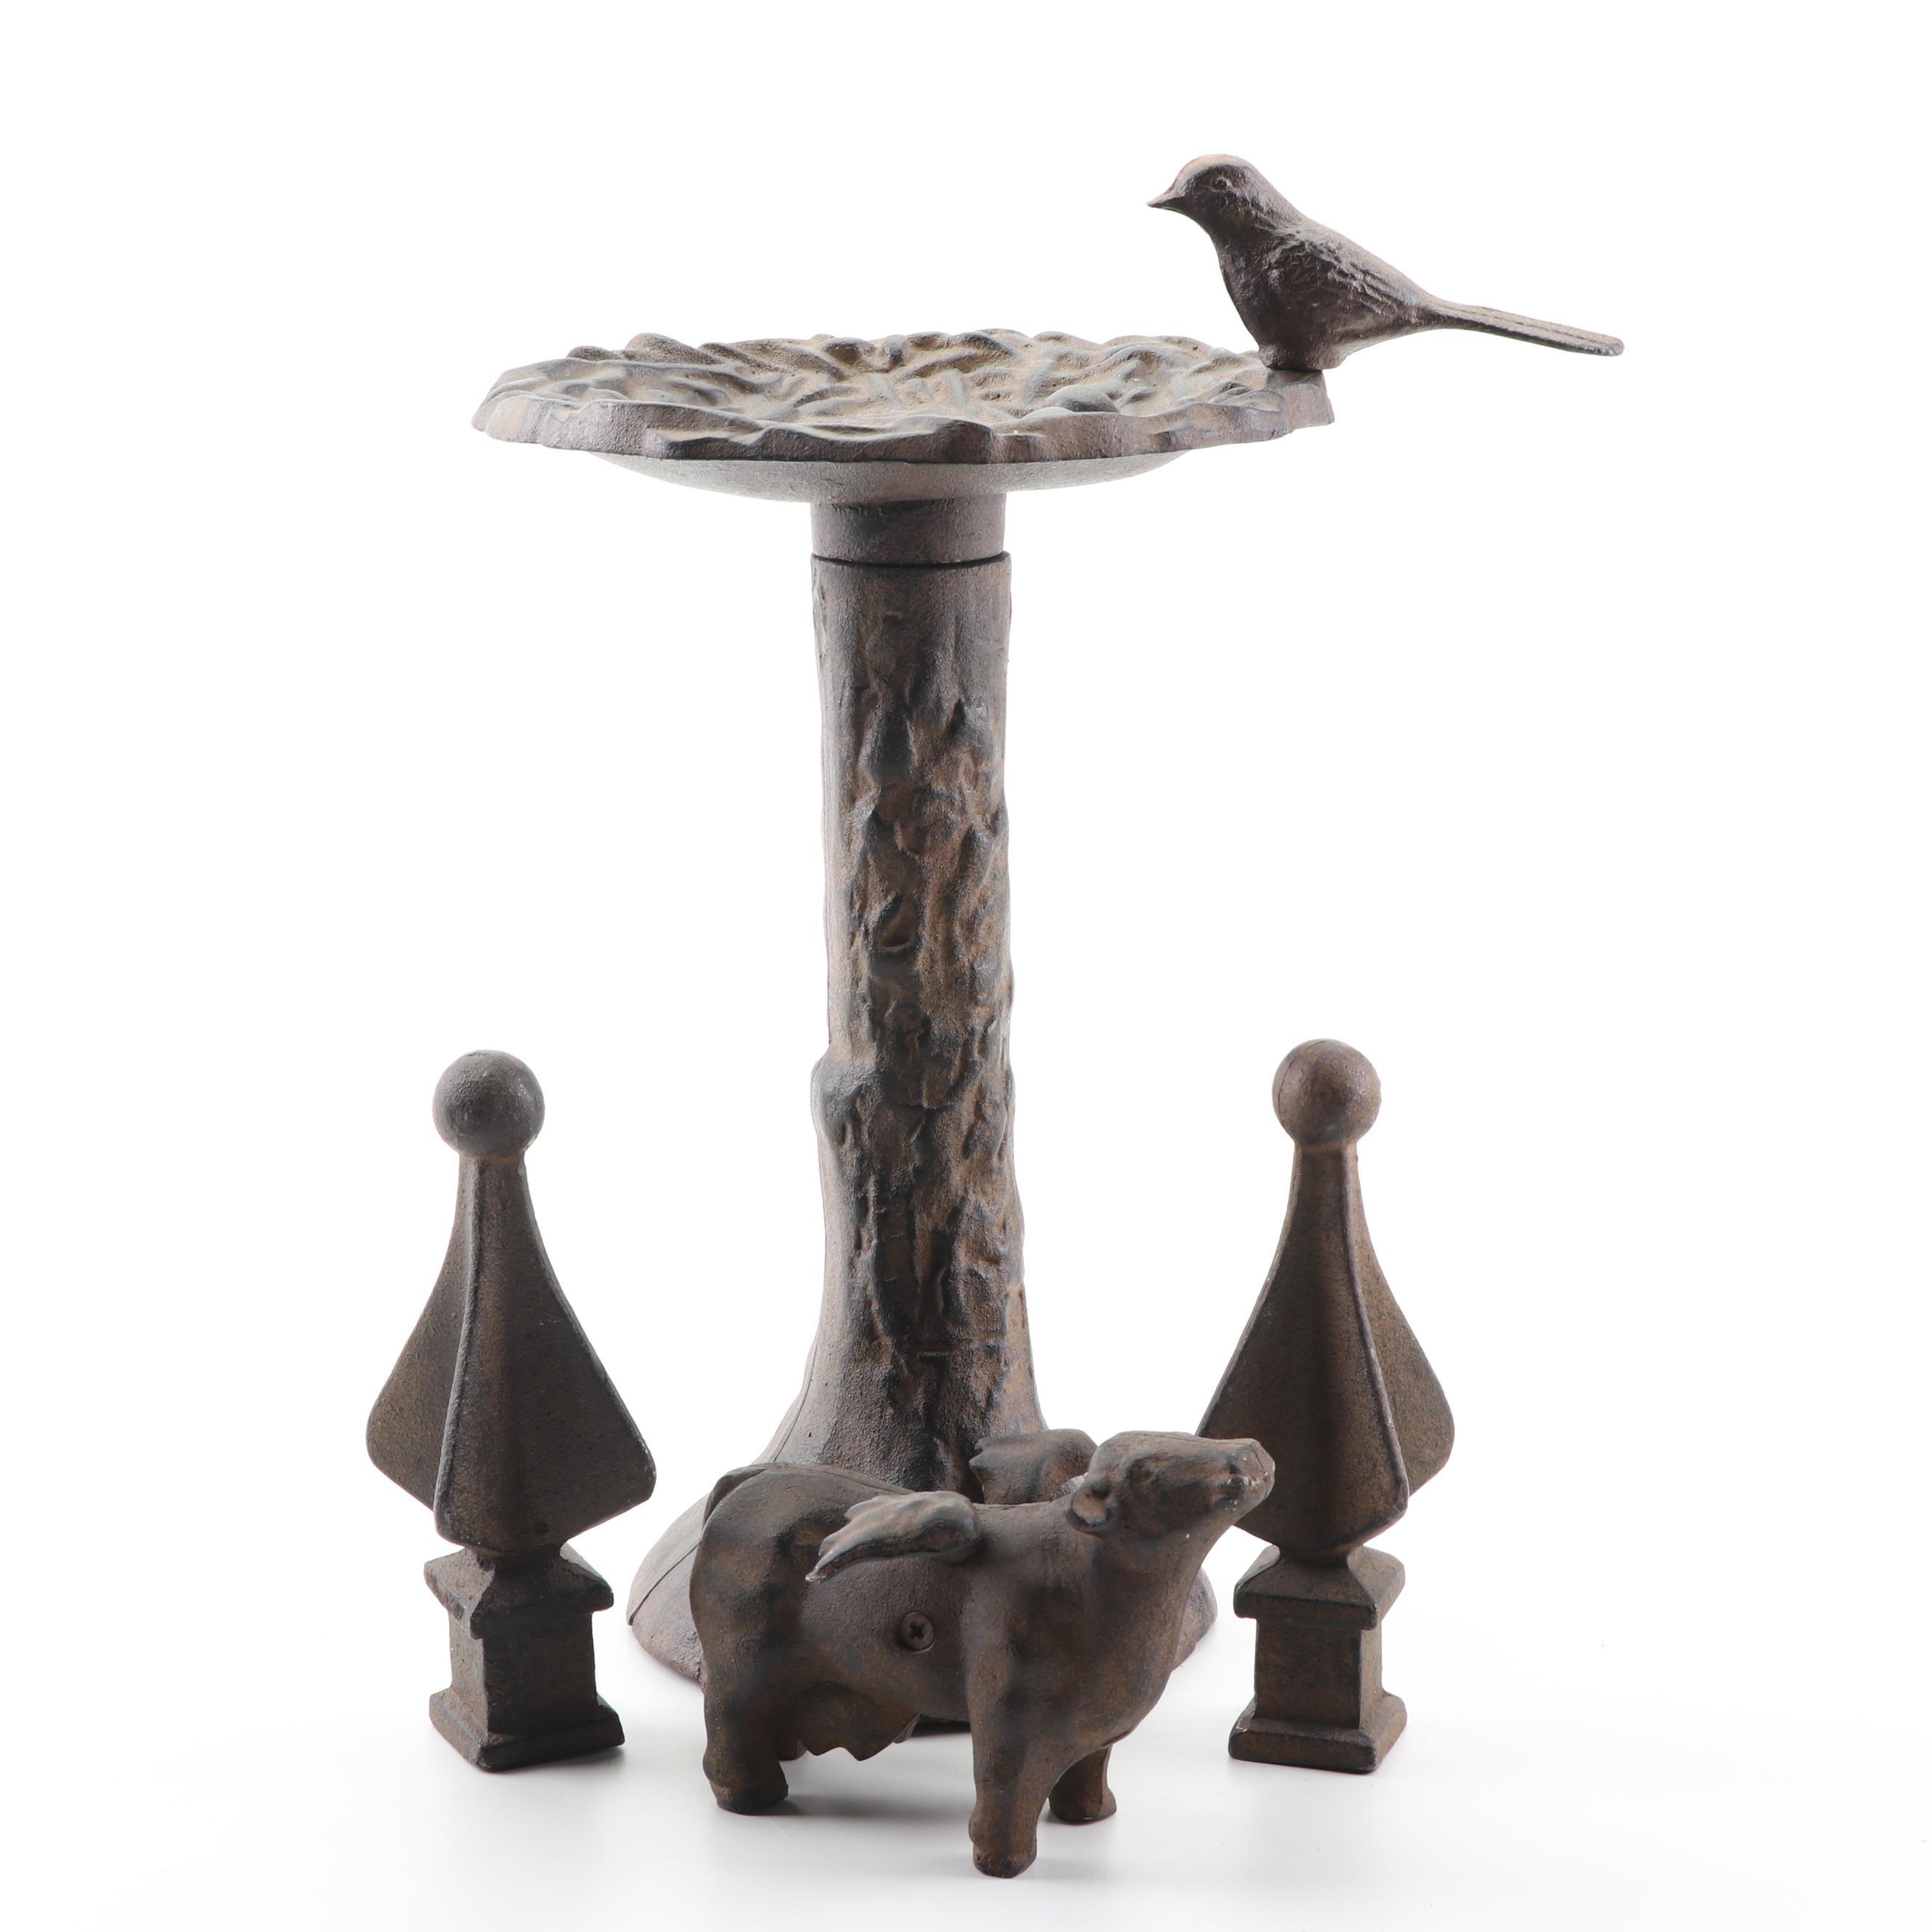 Cast Iron Porcine Figurine, Finials, and Bird Feeder